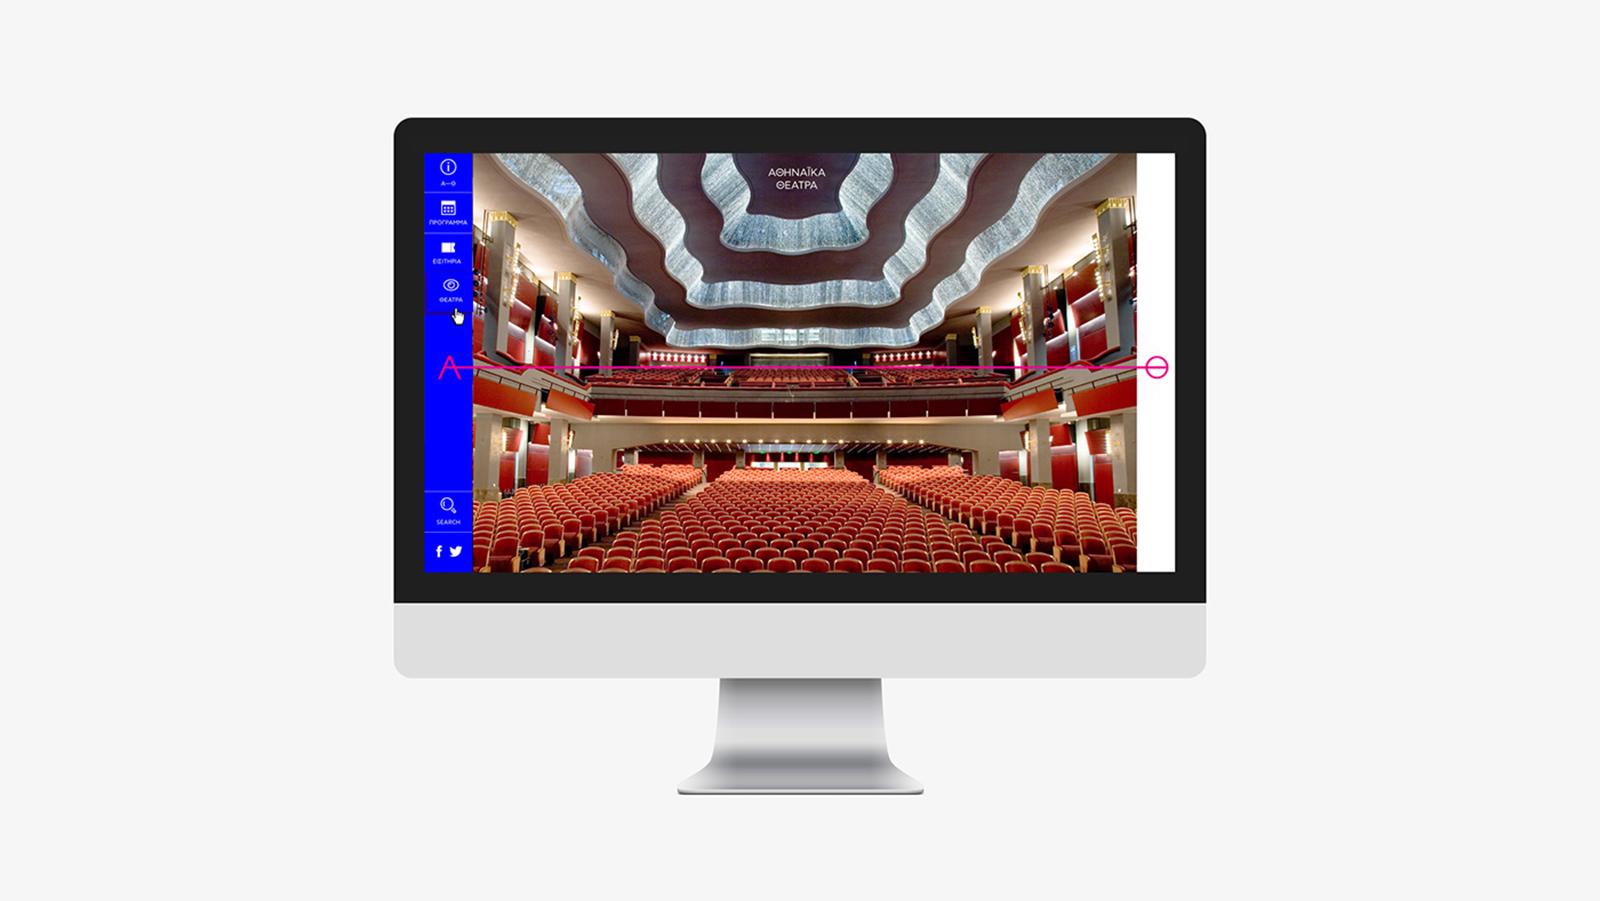 Athenian Theaters雅典劇院品牌VIS視覺形象設計欣賞-VI設計公司